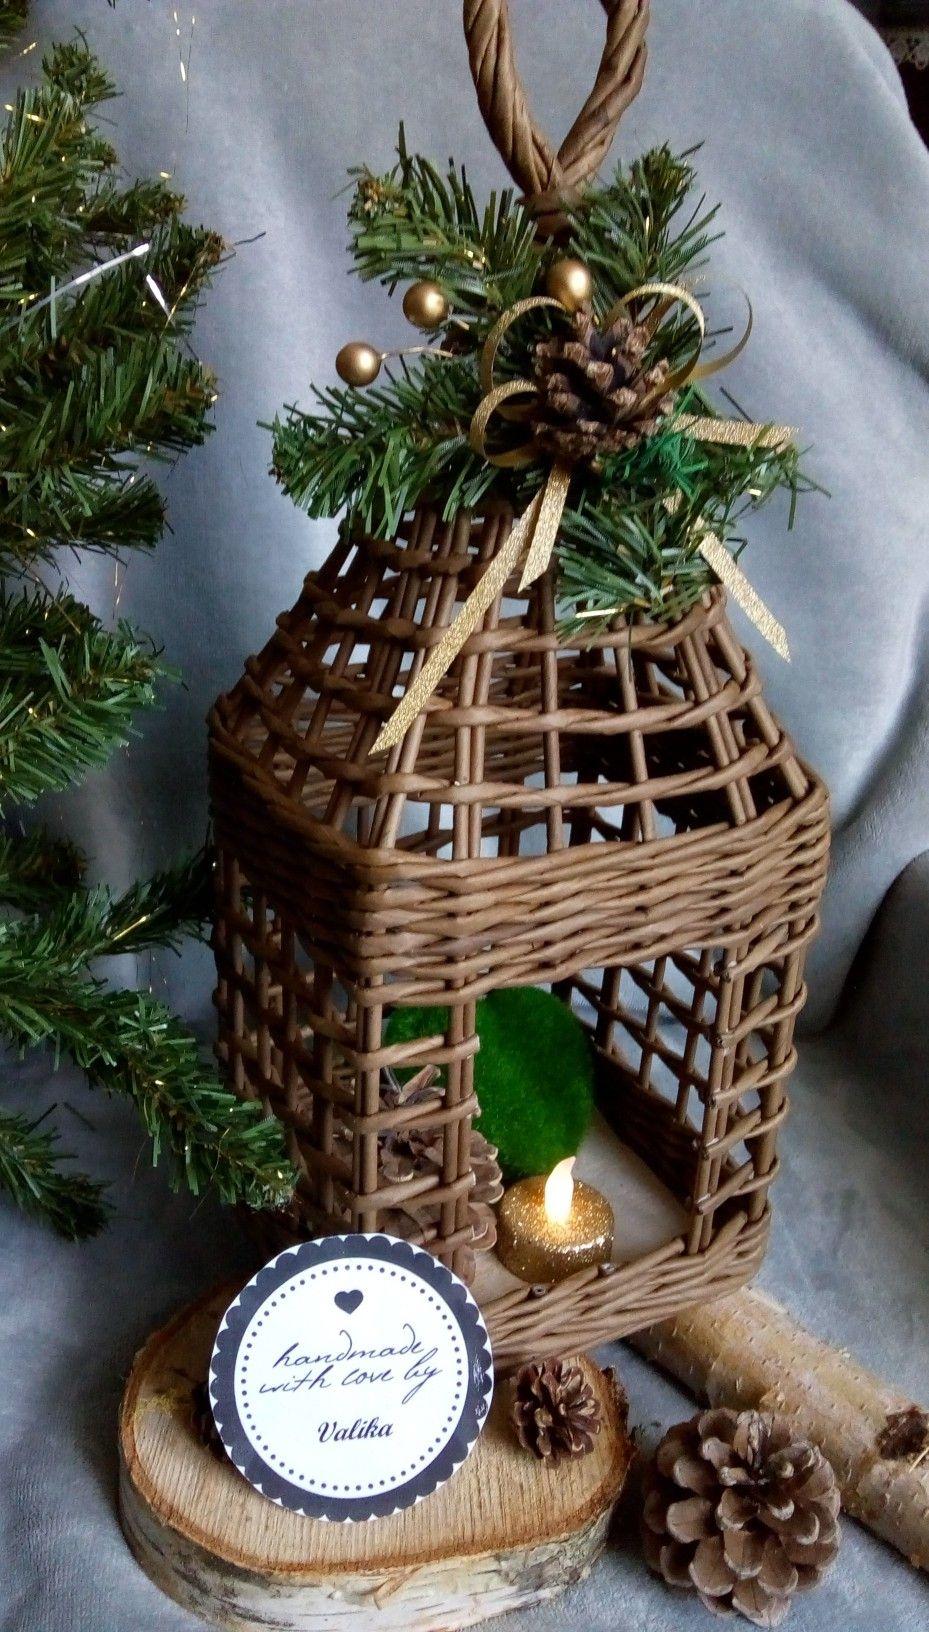 Pin De Marisa Cimenta Em Lanterna Artesanato De Natal